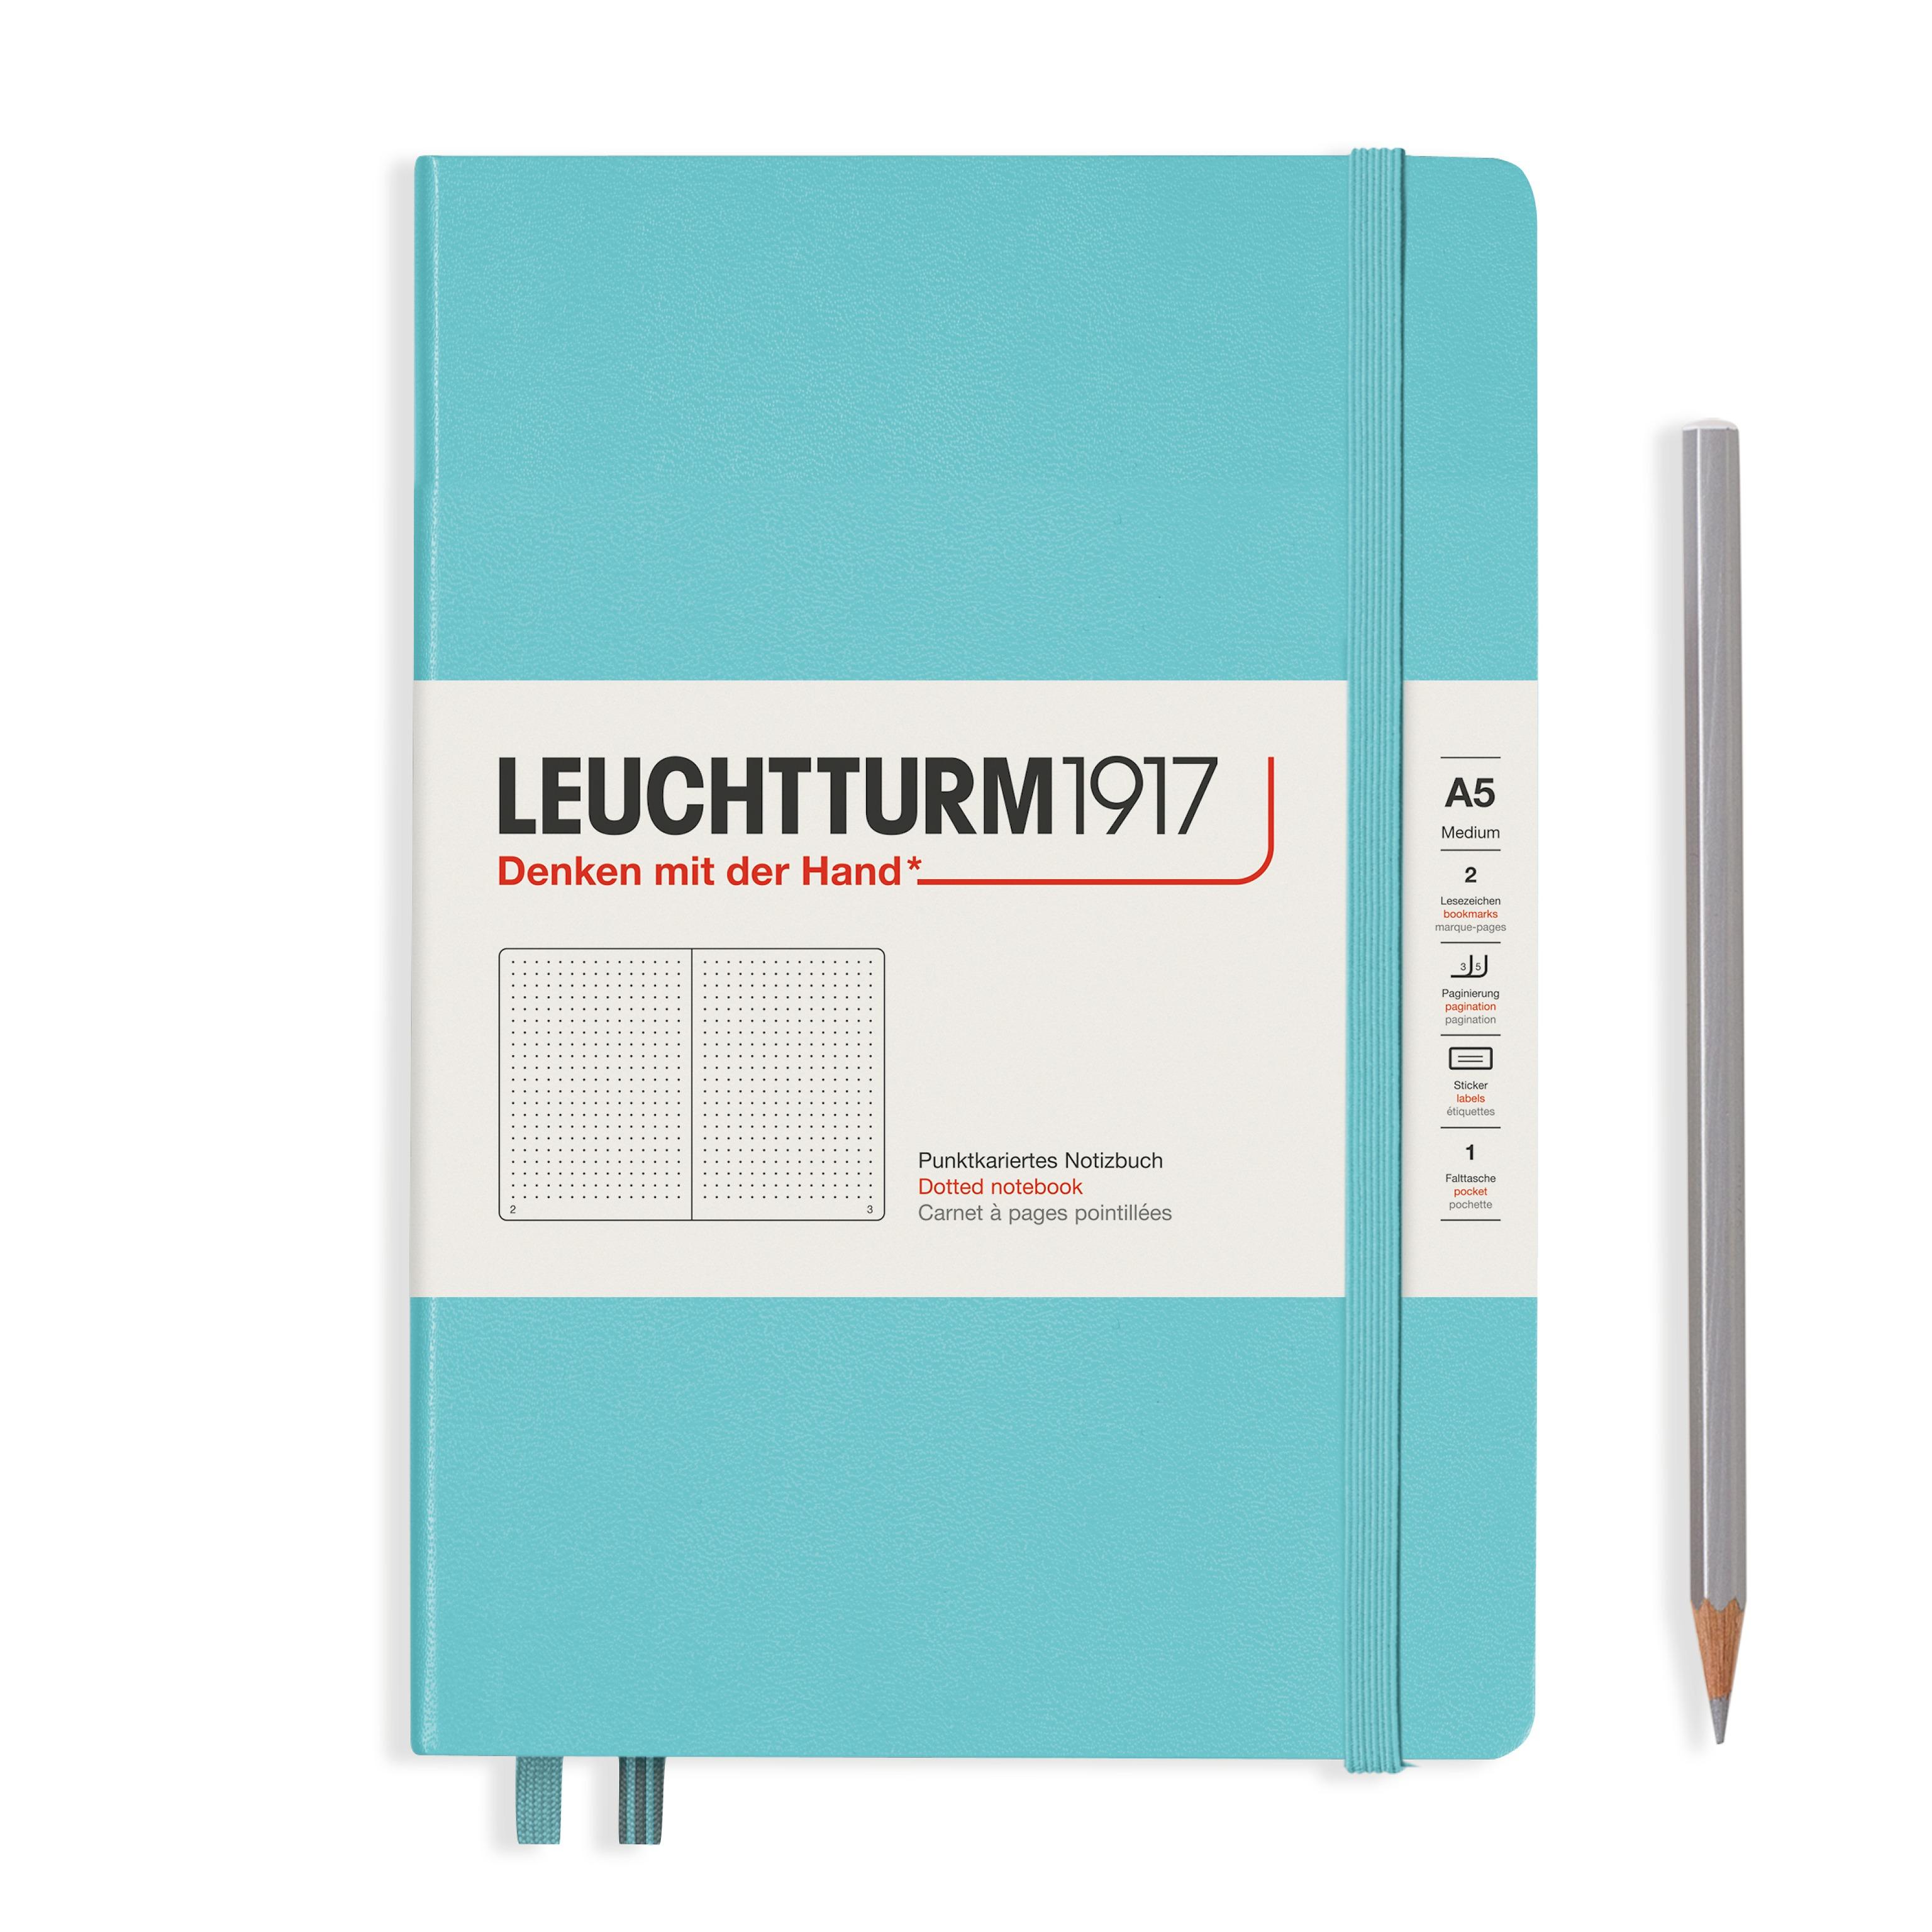 Leuchtturm1917 A5 Hardcover Rising Colours - Aquamarine, Dotted